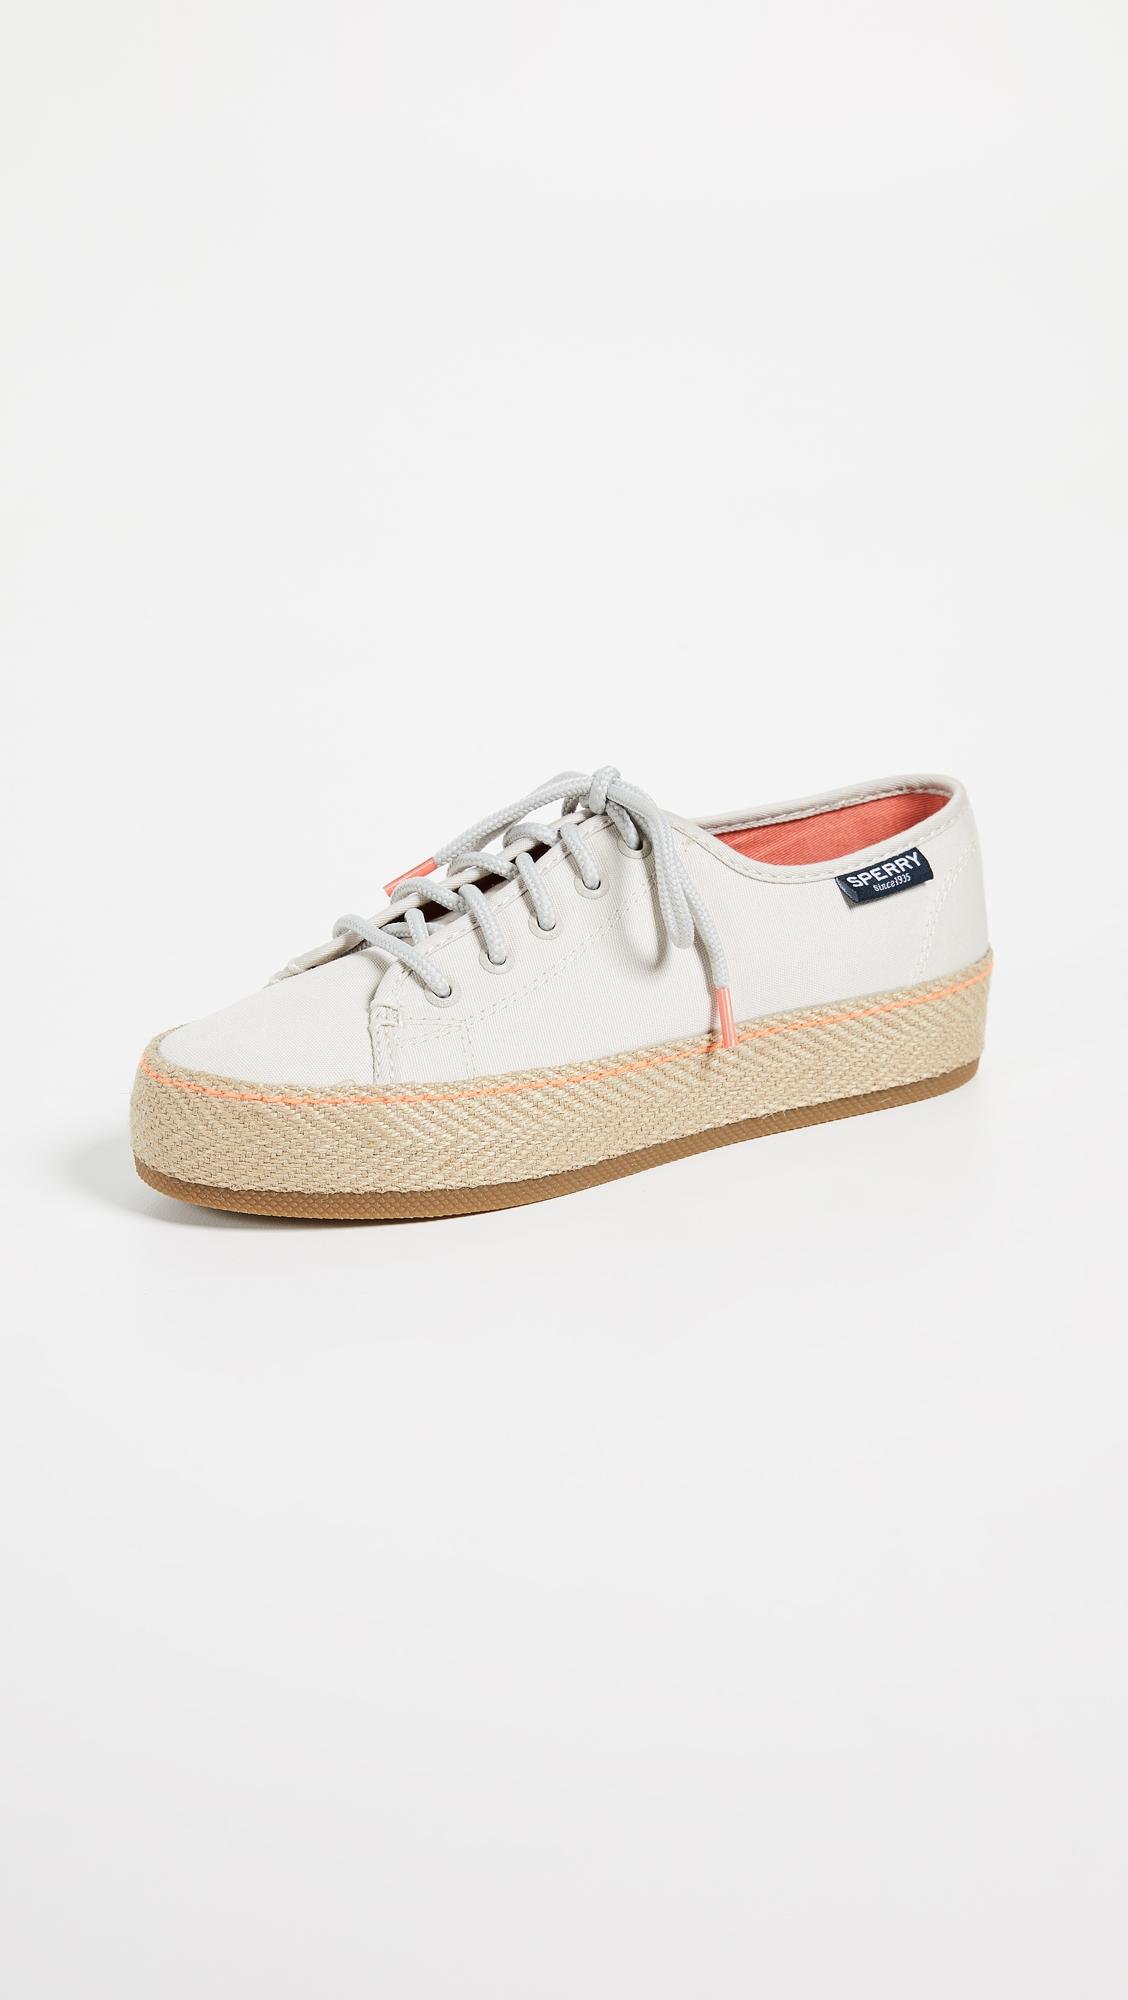 7deb3df2b19f Sperry Sky Sail Jute Wrap Platform Sneakers